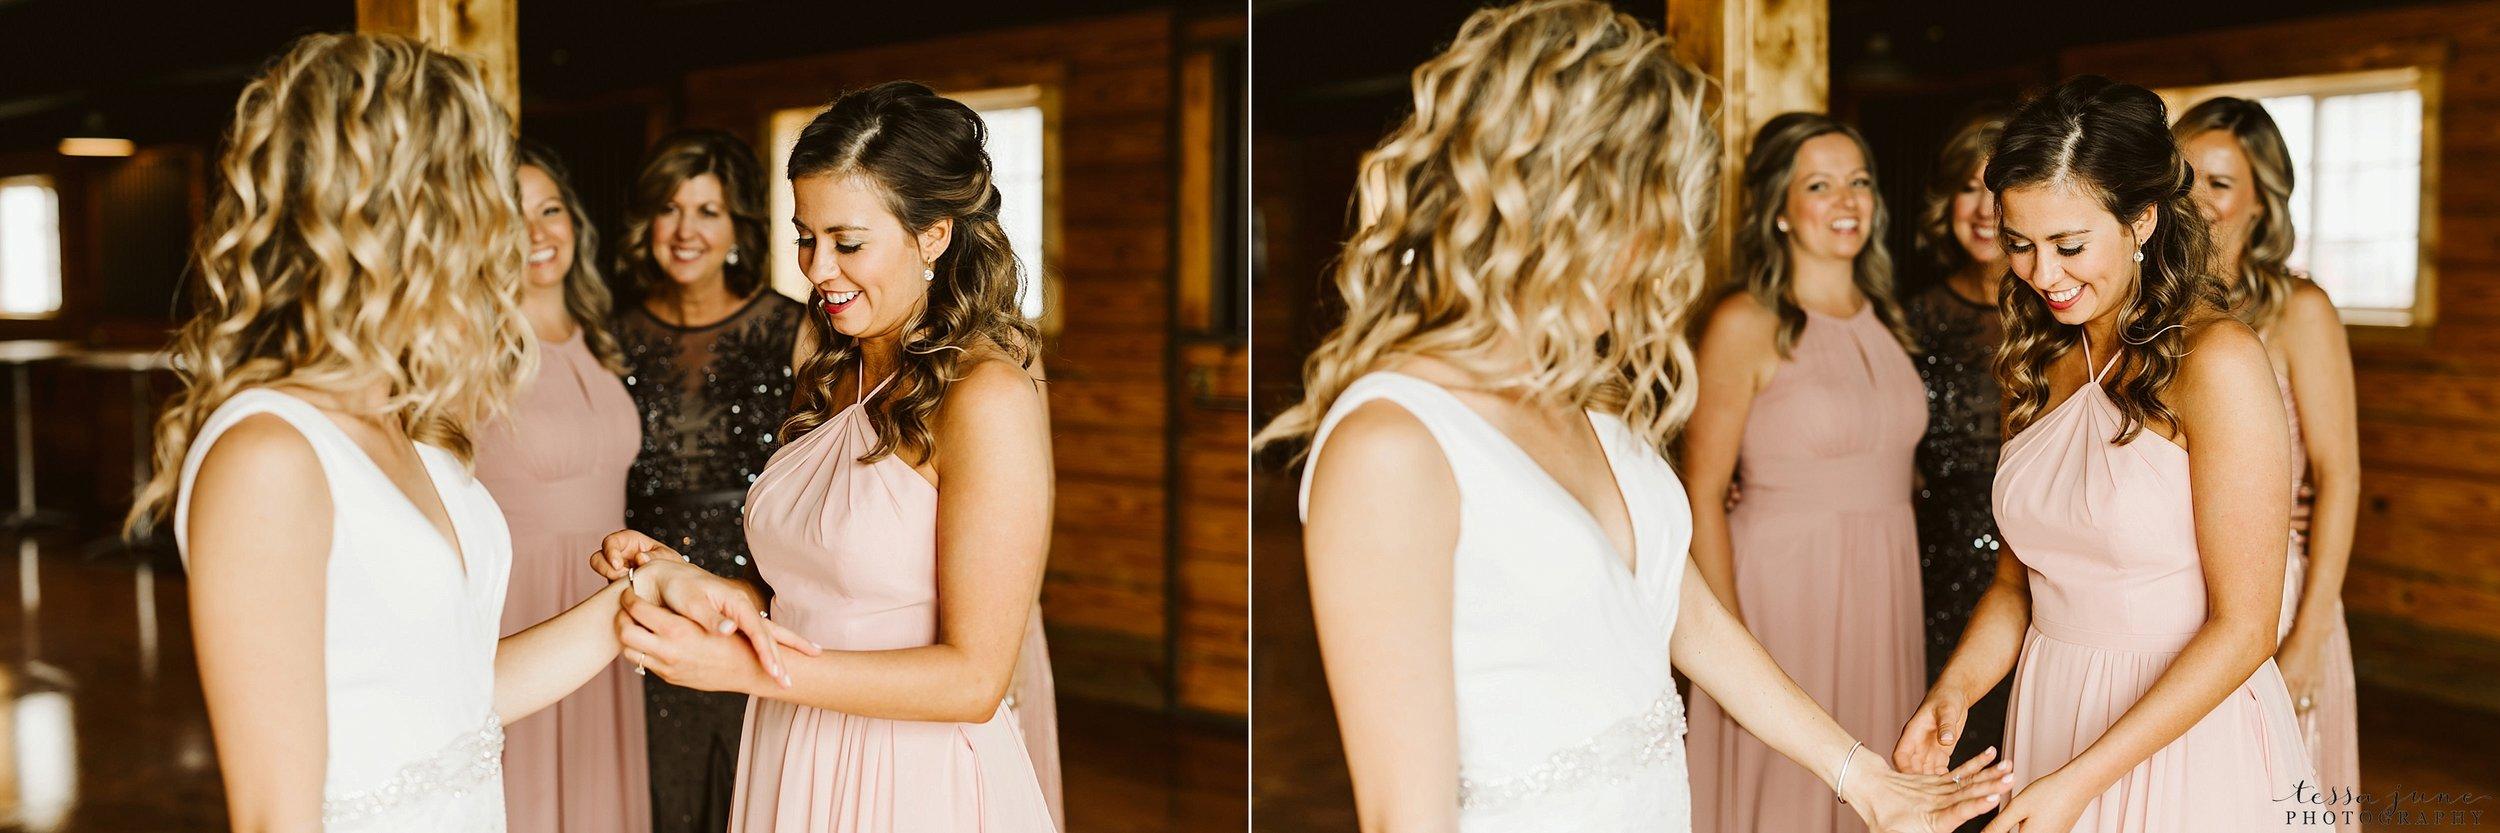 carlos-creek-winery-wedding-summer-pristine-floral-blush-pink-navy-alexandria-minnesota-31.jpg